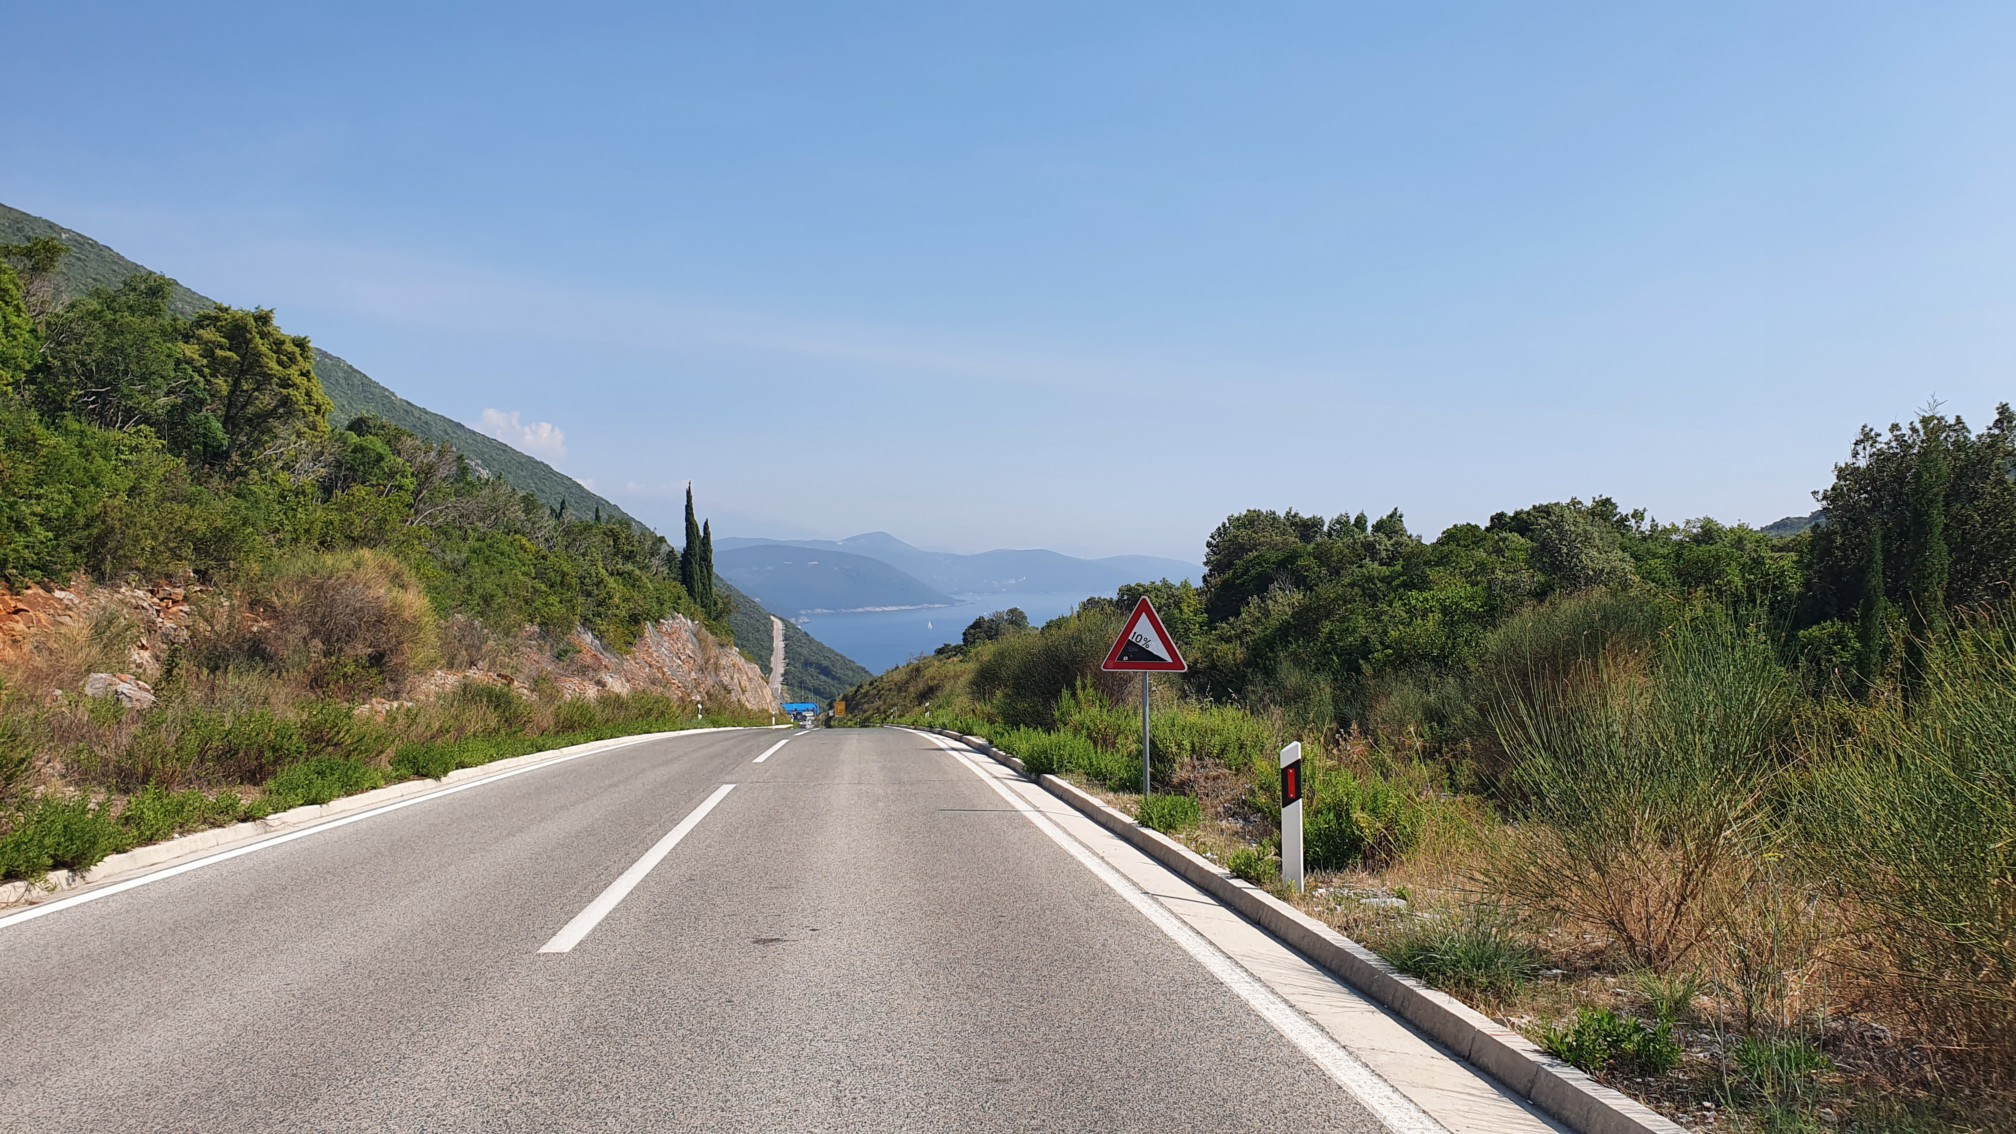 Grenze Kroatien zu Montenegro